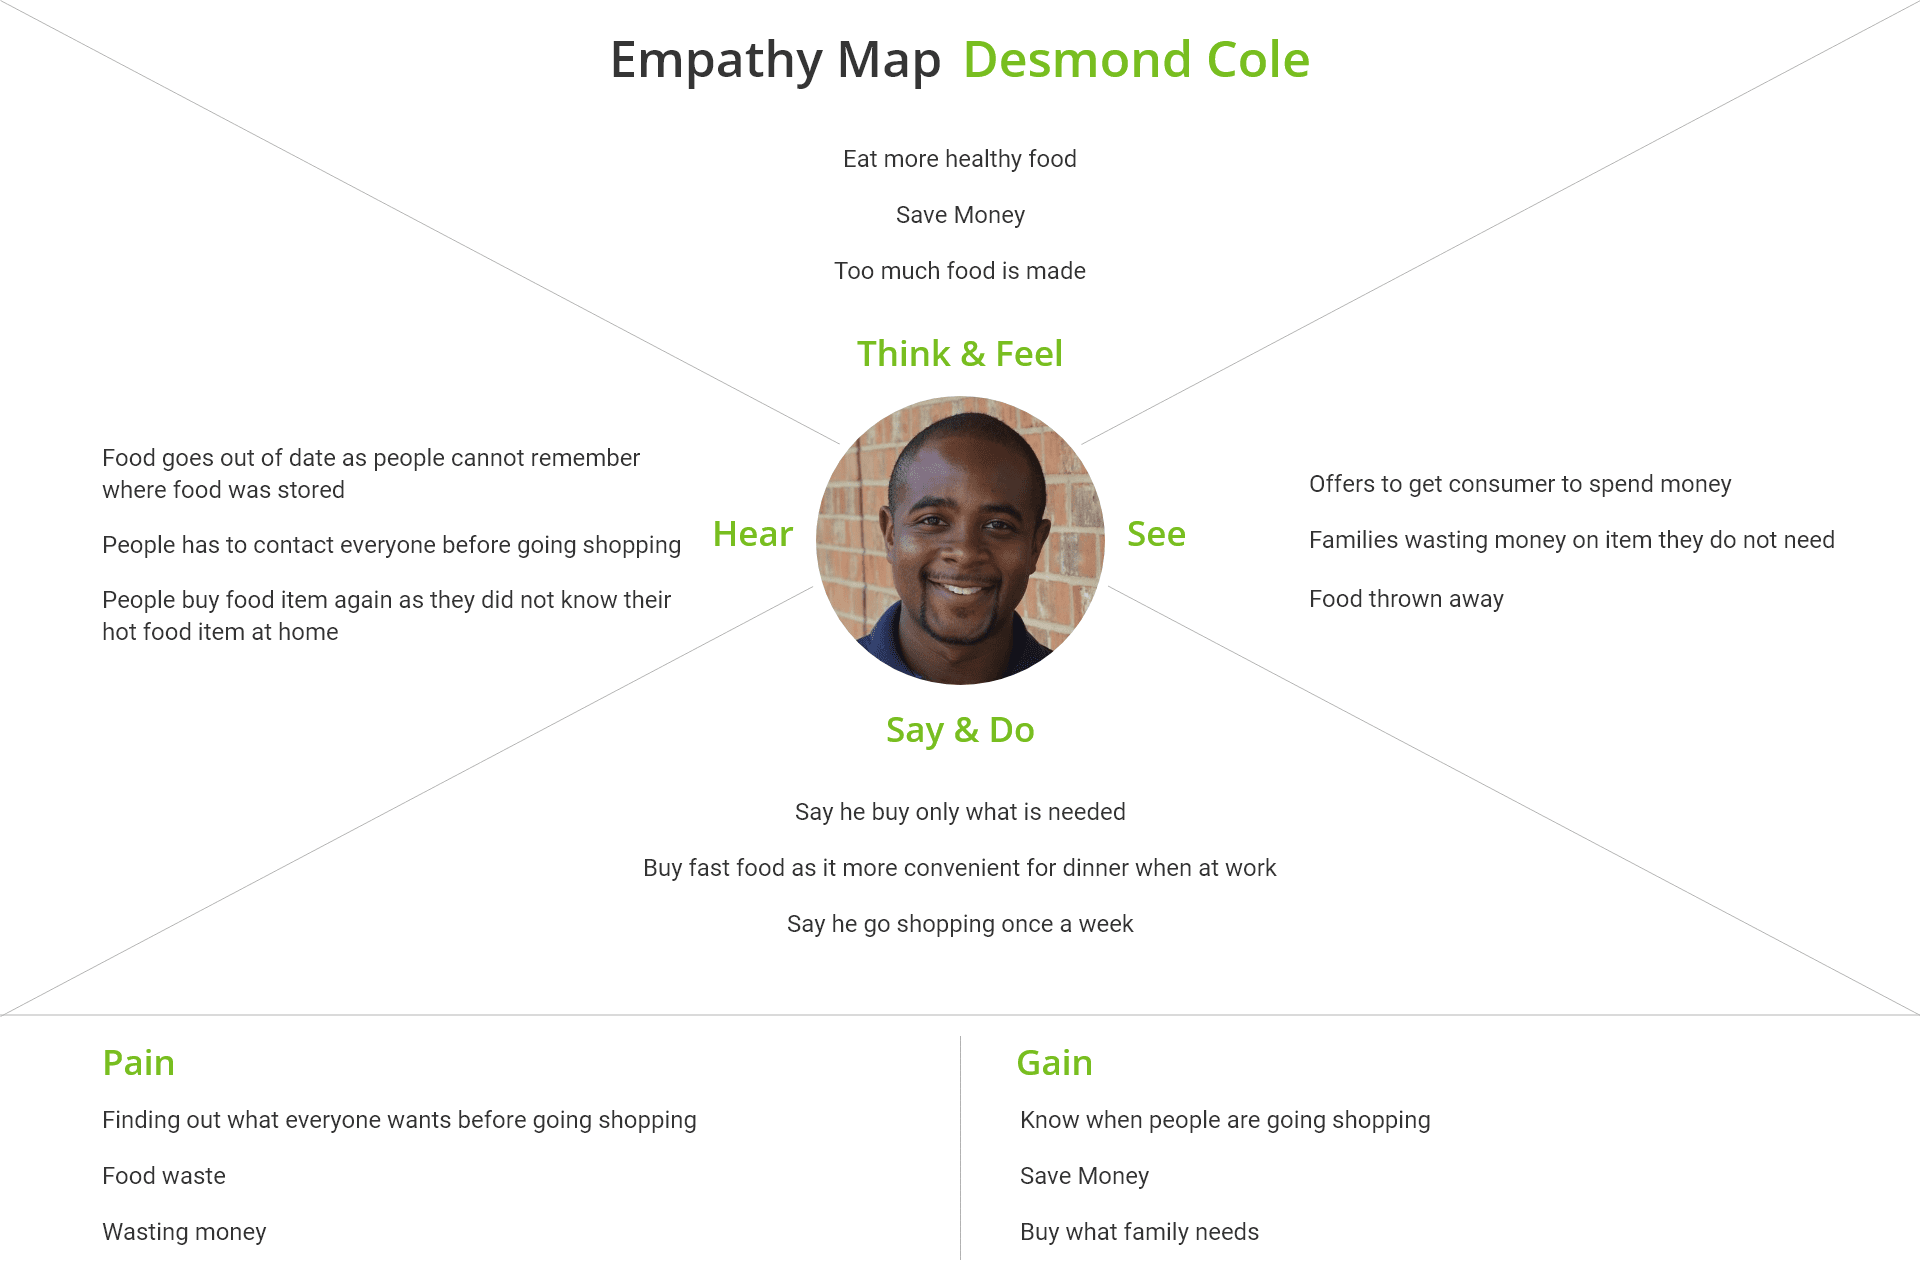 emphathy map Desmond Cole